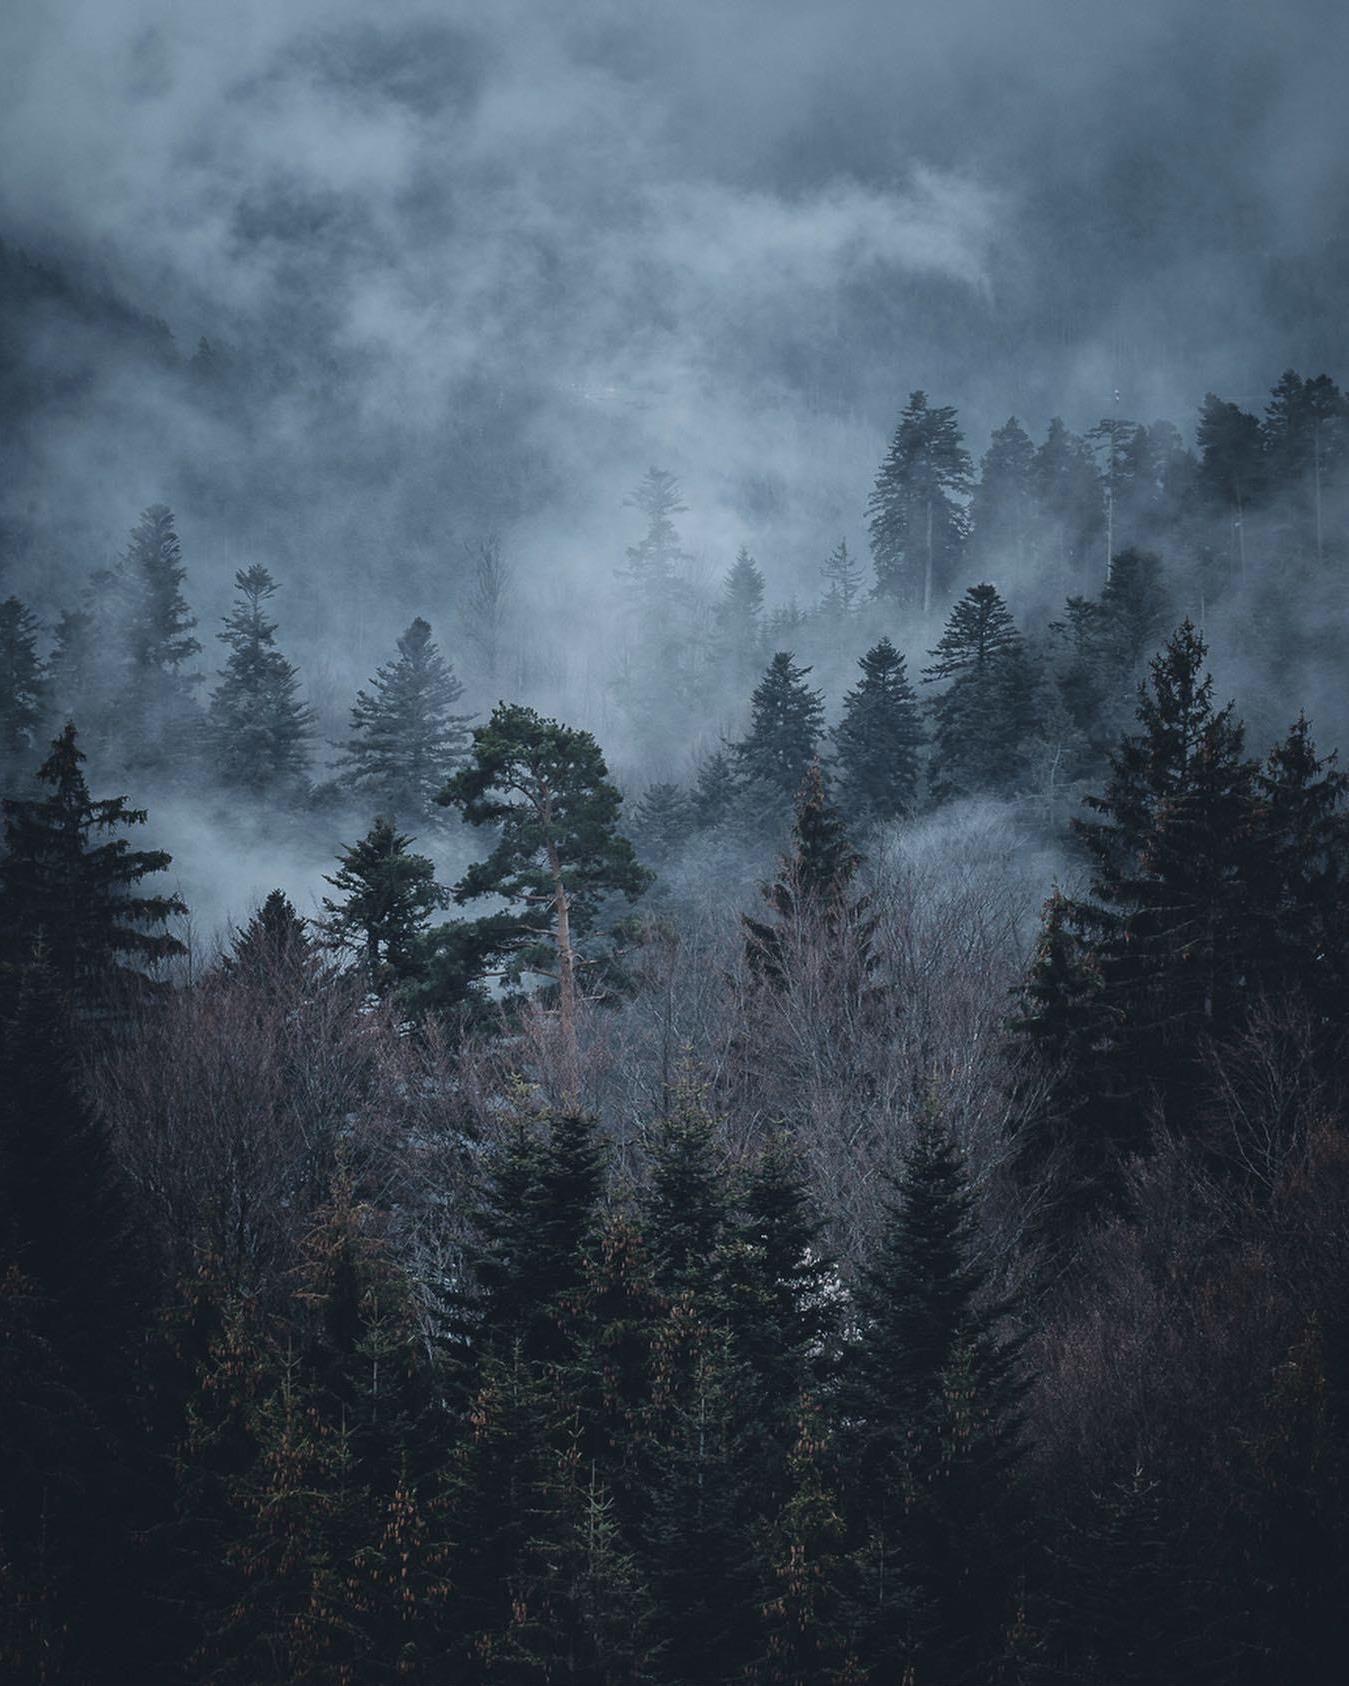 Black Forest Oc 1350x1080 Amitav554 Https Ift Tt 2vrmtkx February 29 2020 At 07 45pmon Reddit Com R Earthpor In 2020 Landscape Landscape Photography Nature Pictures